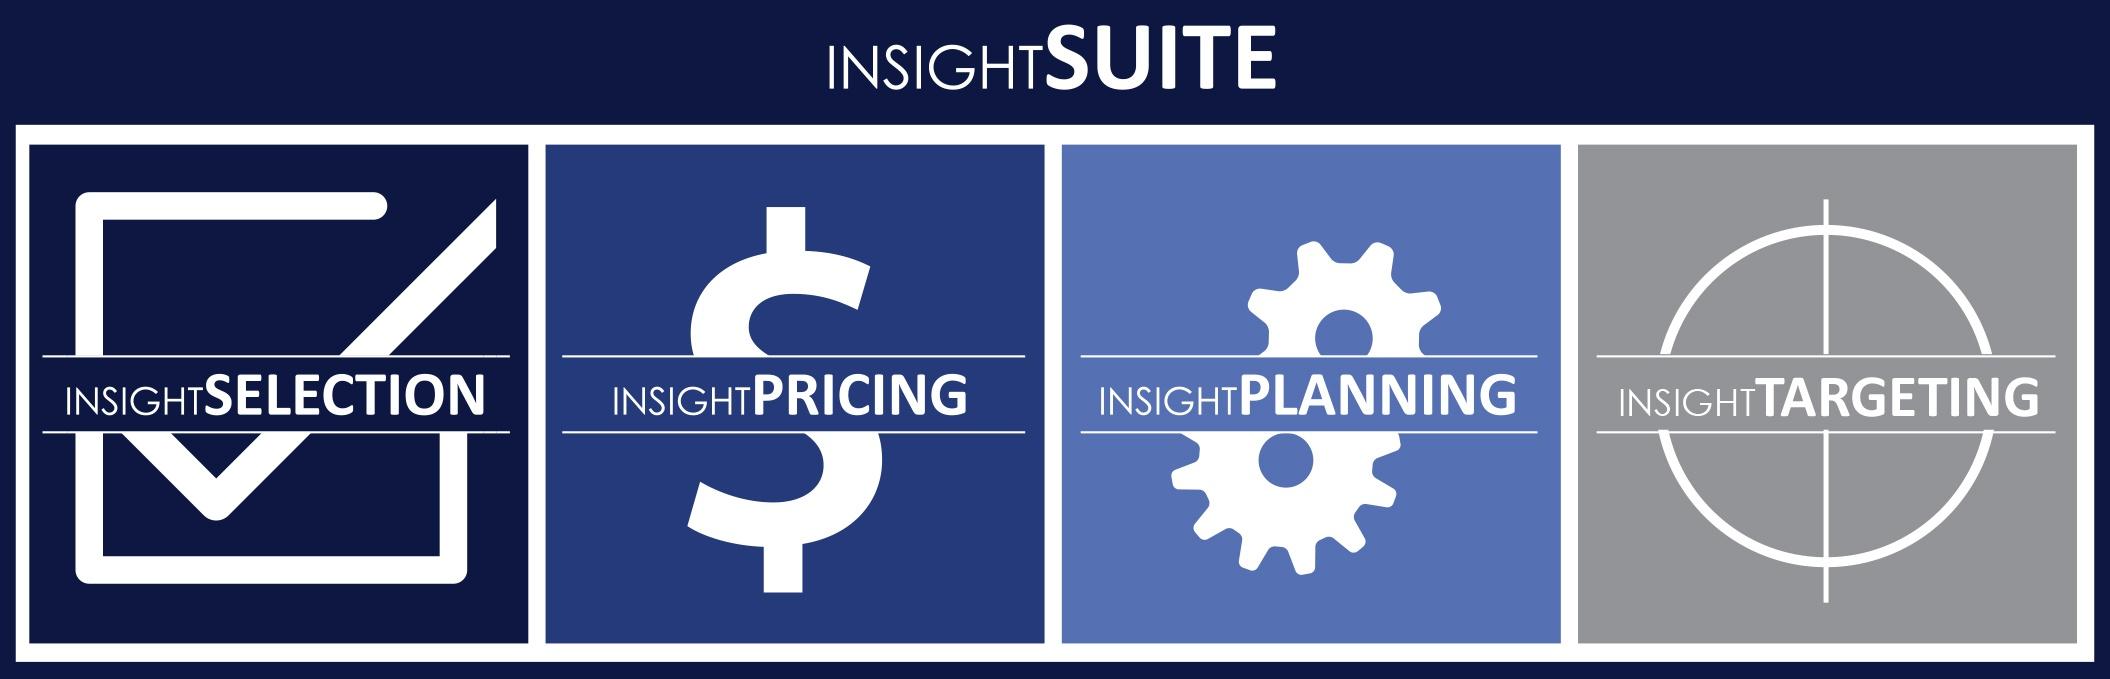 InsightSuite_logo_FINAL1-1